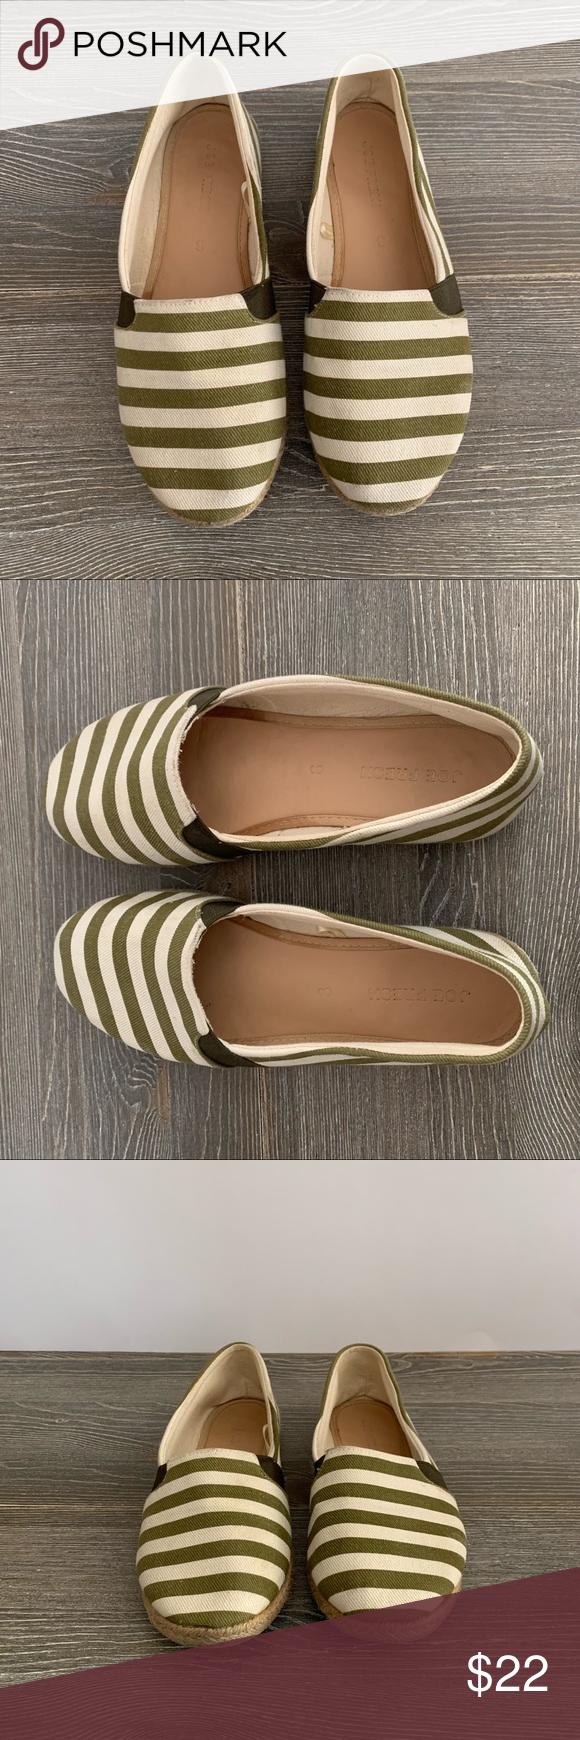 6d381931b935f Green White Stripe Slip On Sneaker - Shoes Size 8 In great shape. Very  clean. Size 8 by Joe Fresh Canvas upper Rubber soles Joe Fresh Shoes Flats    Loafers